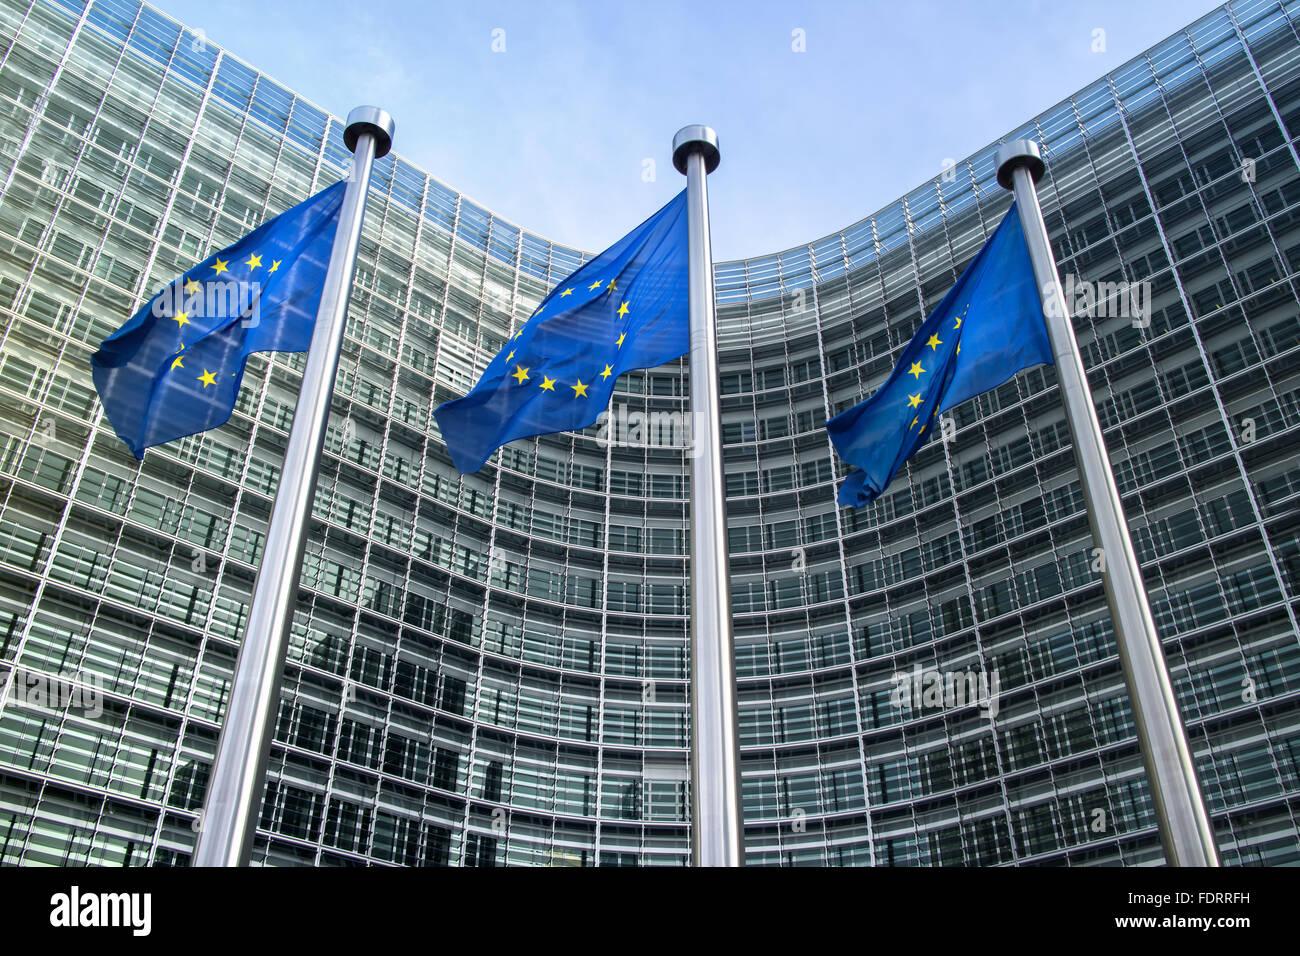 eu,brussels,european union flag,european commission,berlaymont building - Stock Image